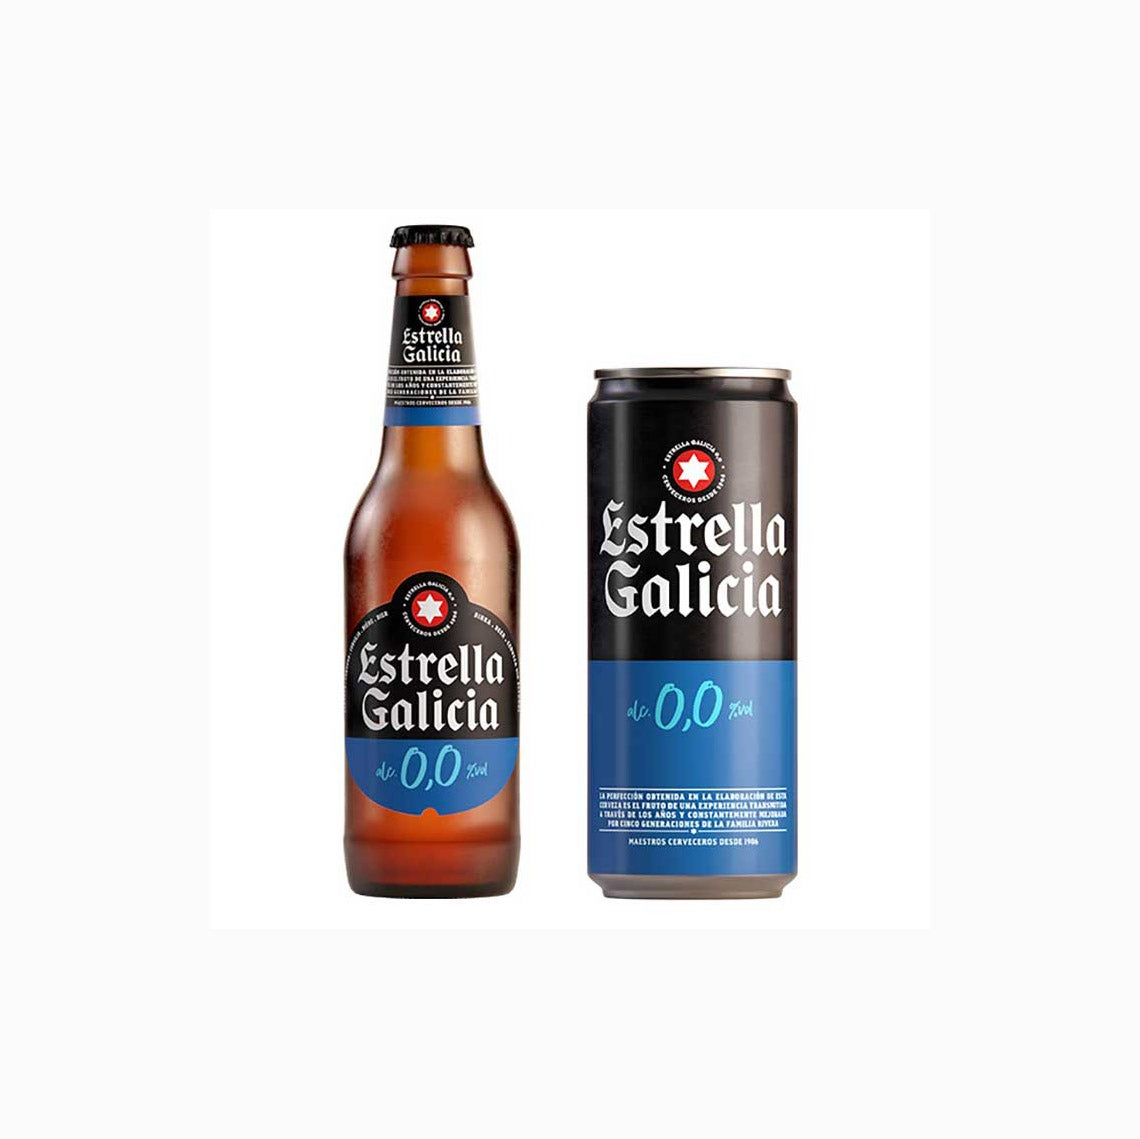 best-non-alcoholic-beer-pilsner-estrella-galicia-saveur